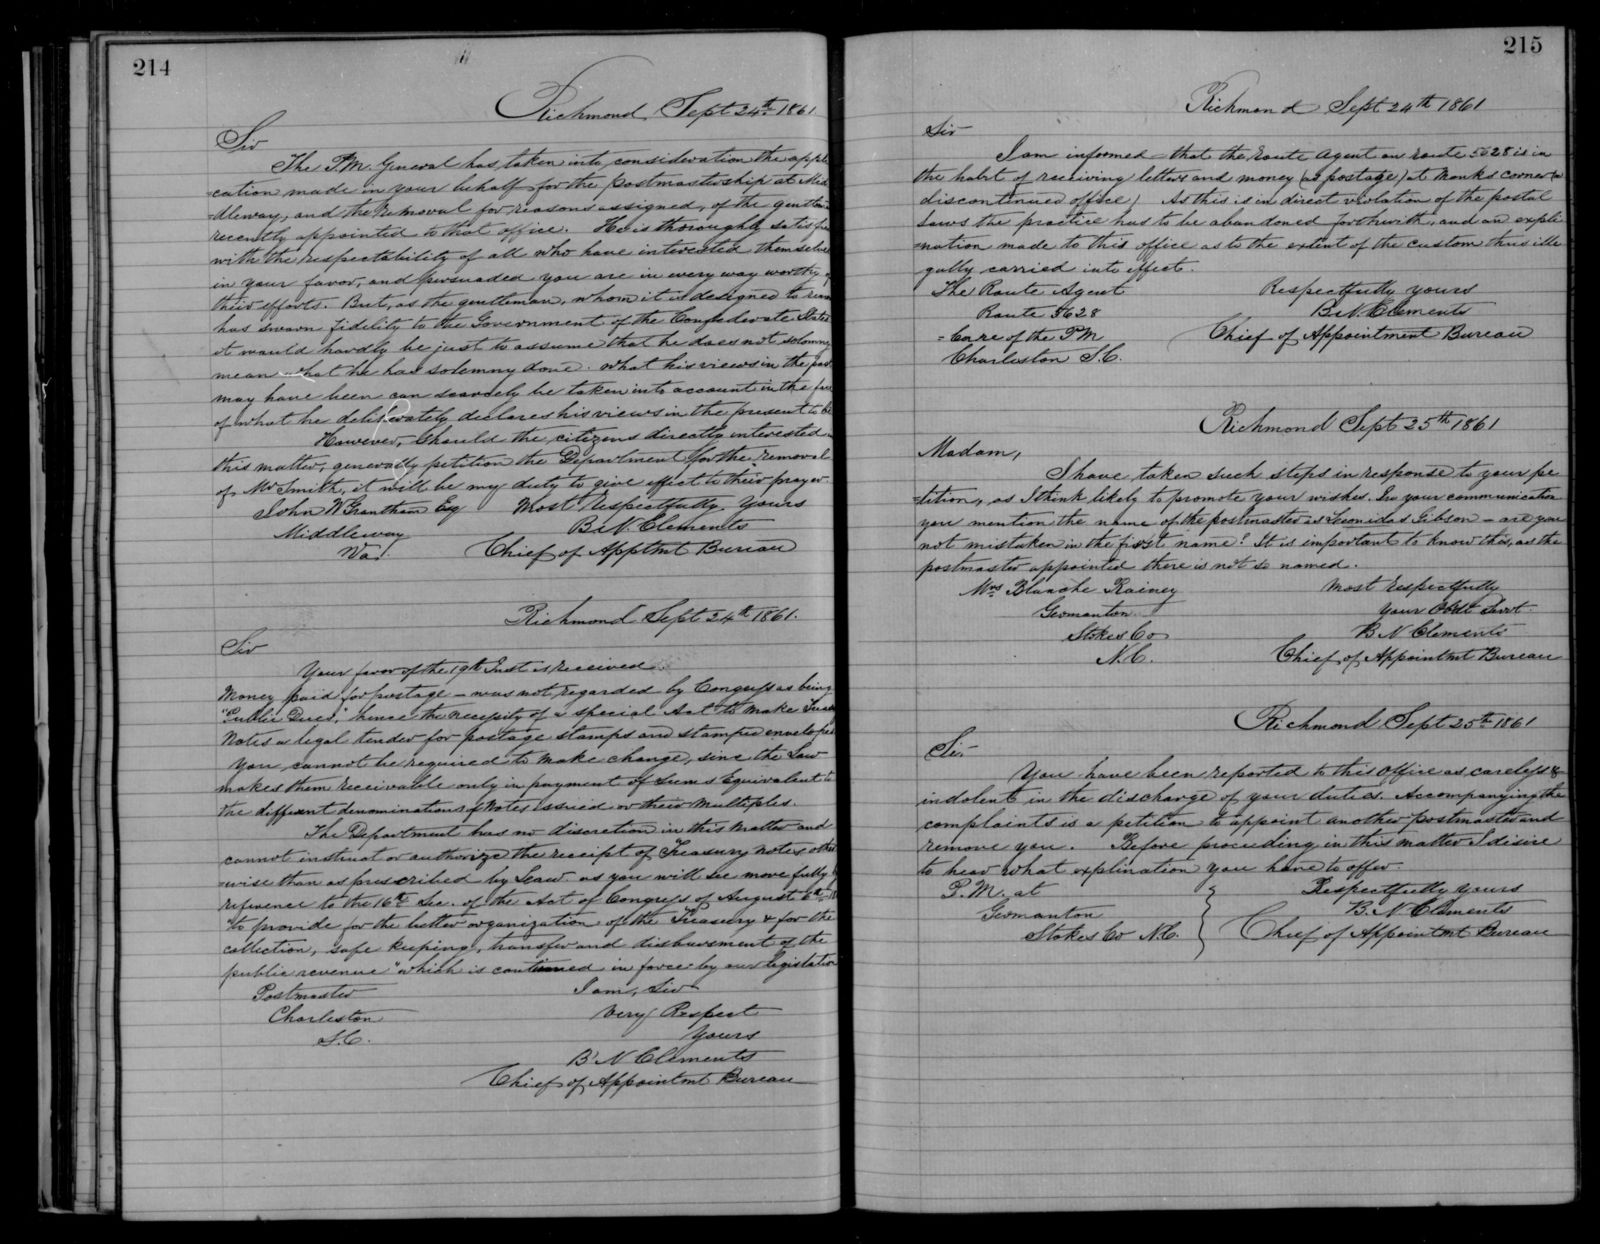 Confederate States of America records: Microfilm Reel 49